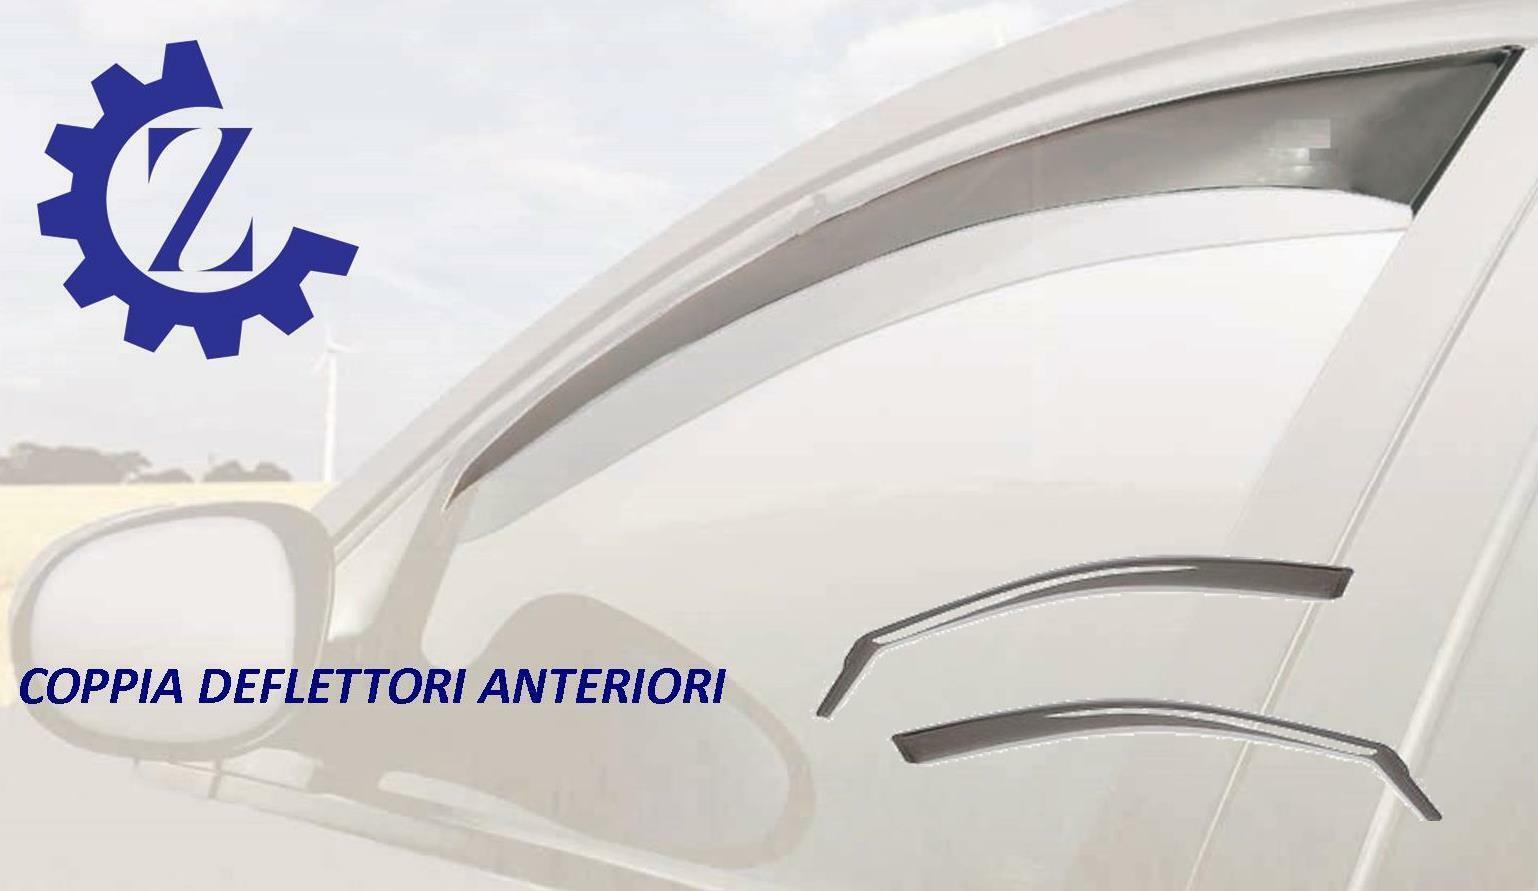 DEFLETTORI ANTERIORI PER VW GOLF IV 3 PORTE